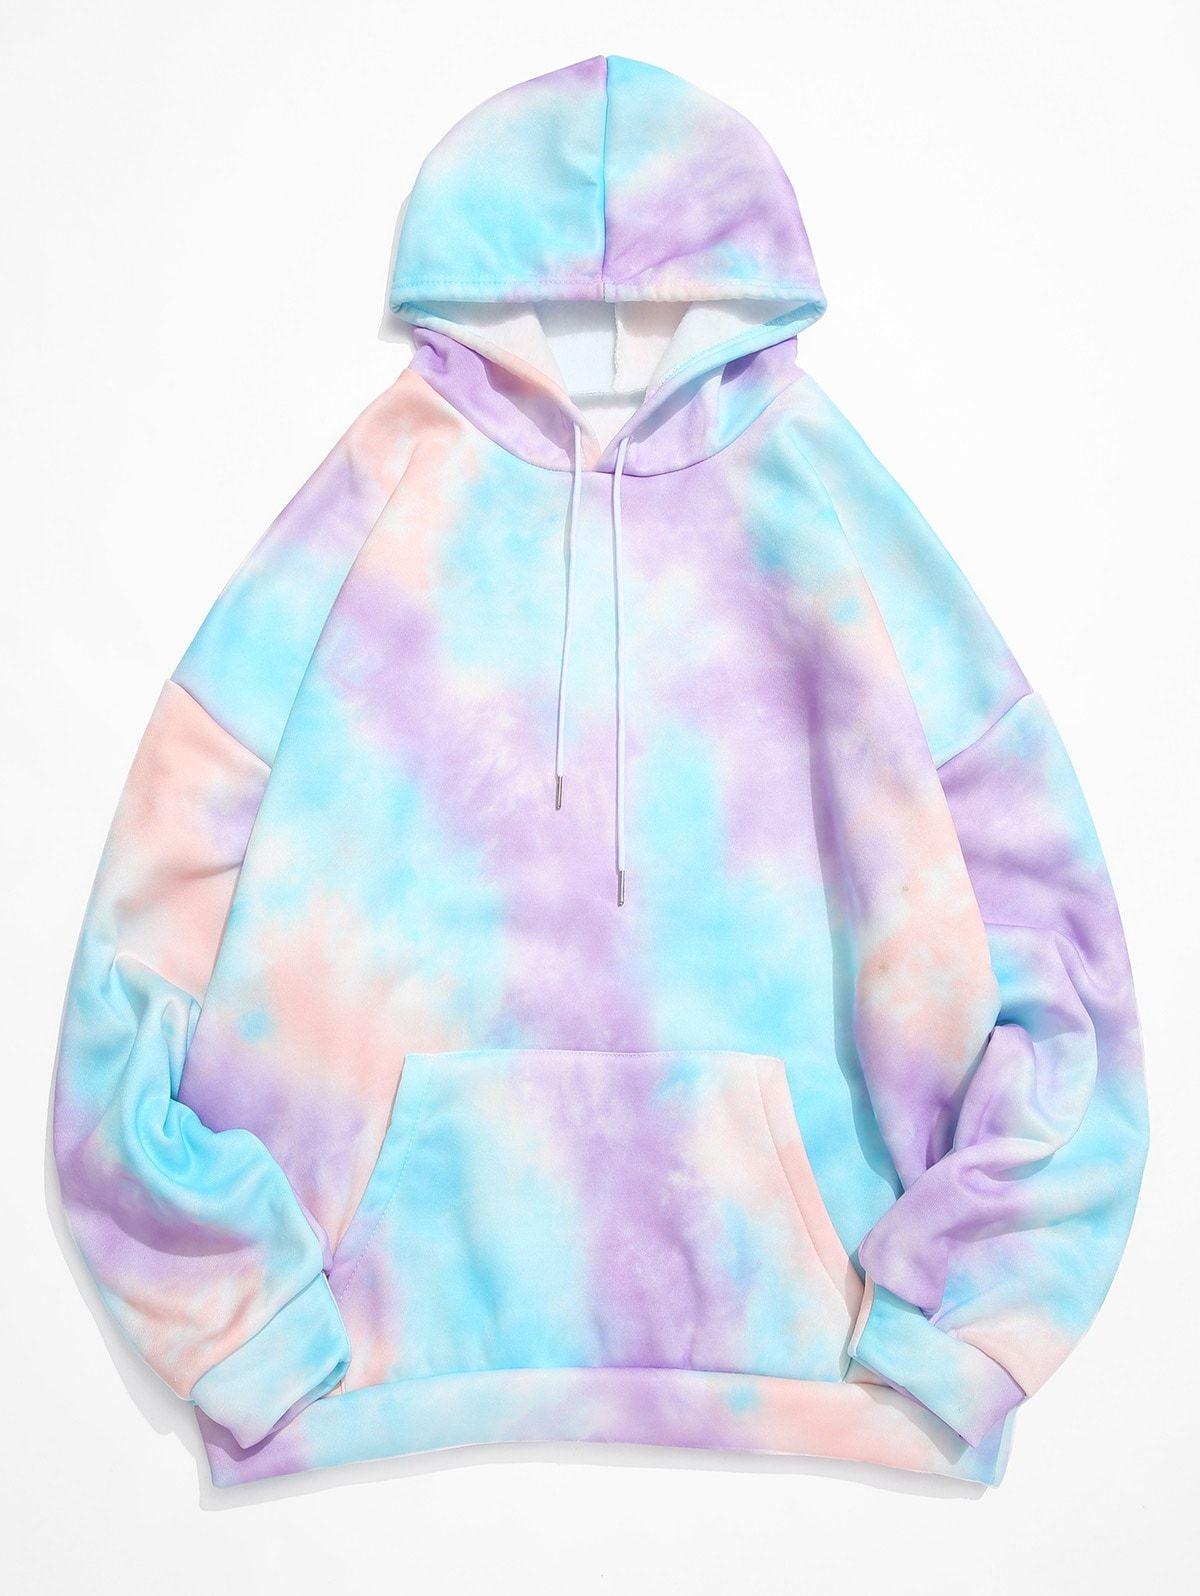 Tie Dye Kangaroo Pocket Fleece Pullover Hoodie Purple Affiliate Kangaroo Pocket Tie Dye Hoodie Ad Tie Dye Outfits Tie Dye Hoodie Stylish Hoodies [ 1596 x 1200 Pixel ]